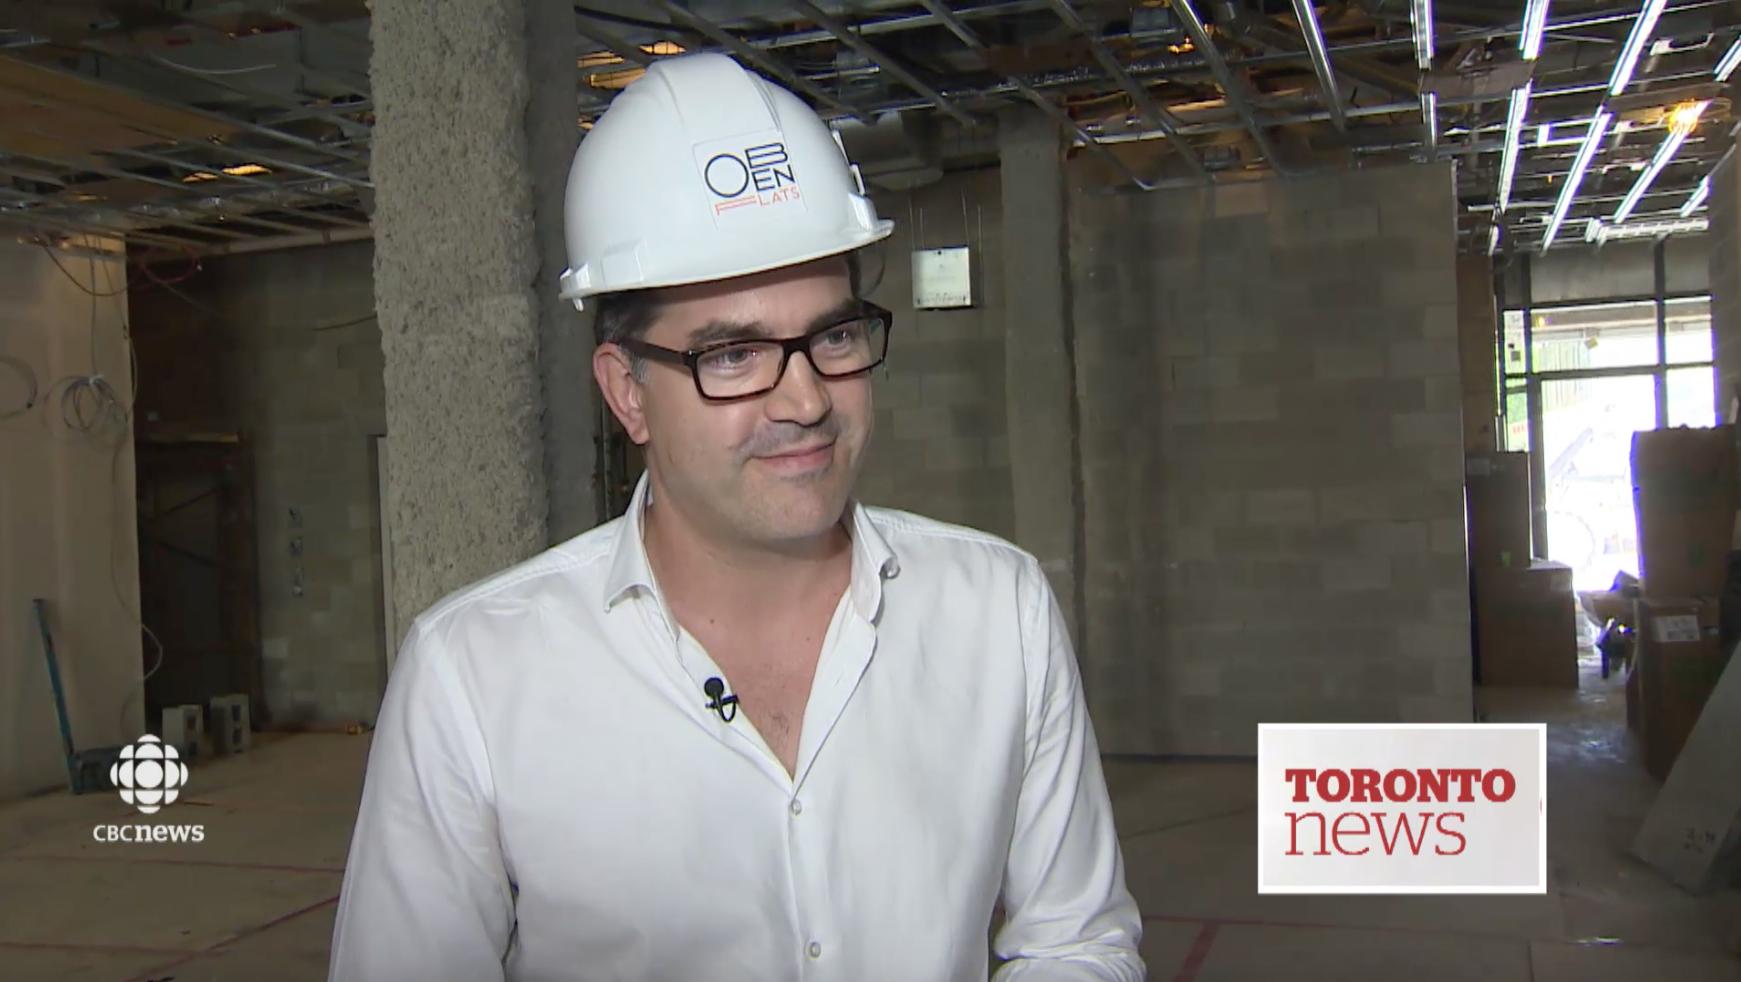 Oben Flats on CBC Toronto News